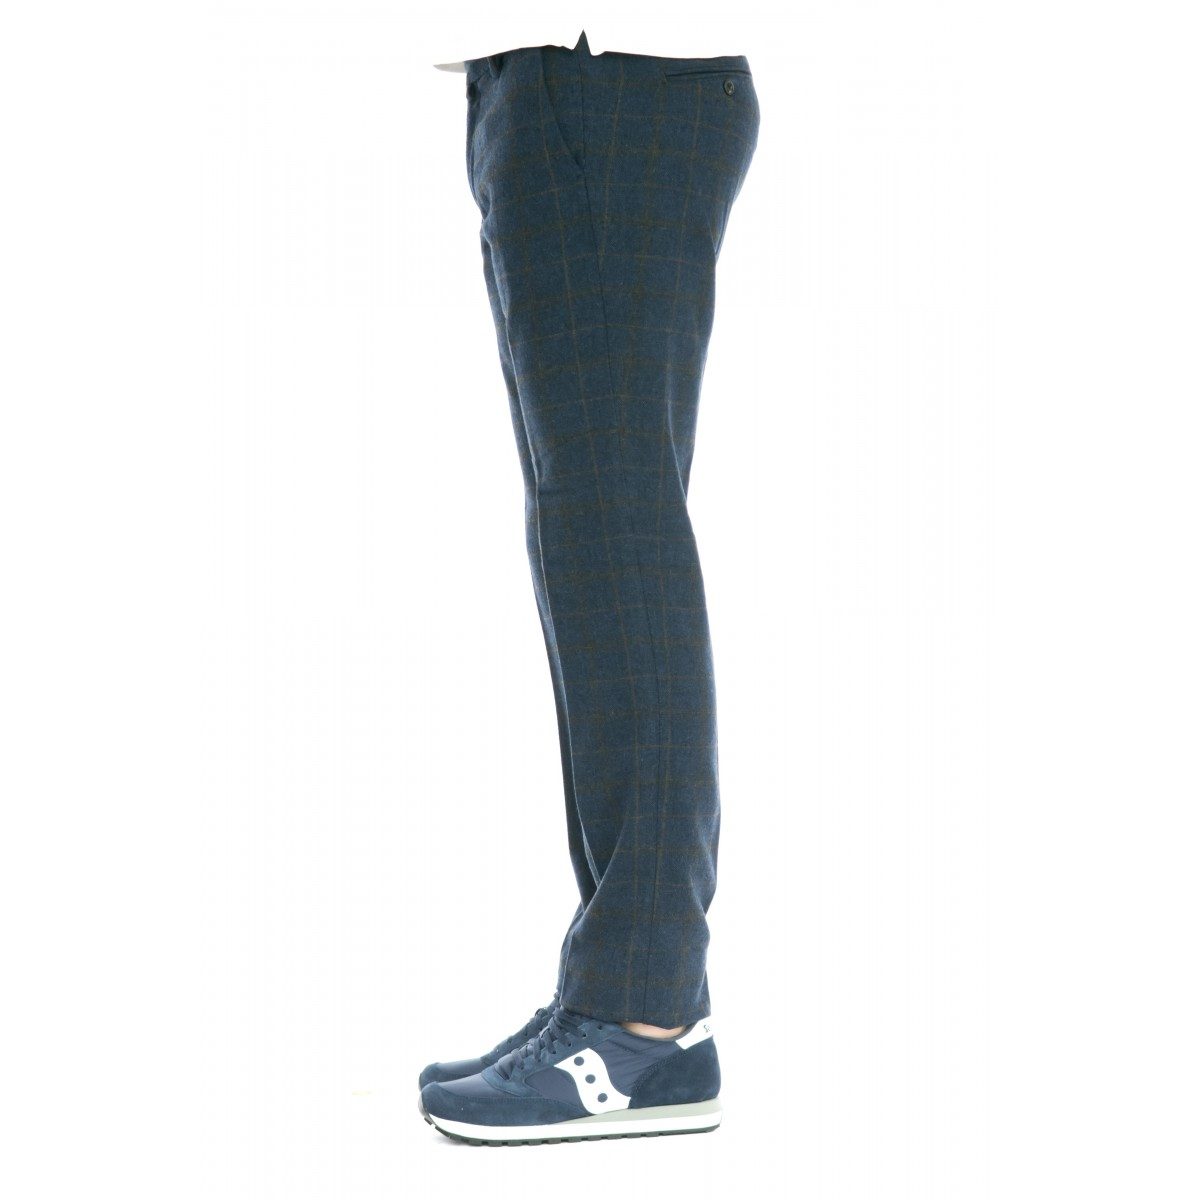 Pantalone uomo - Len 4738 check lana stampata